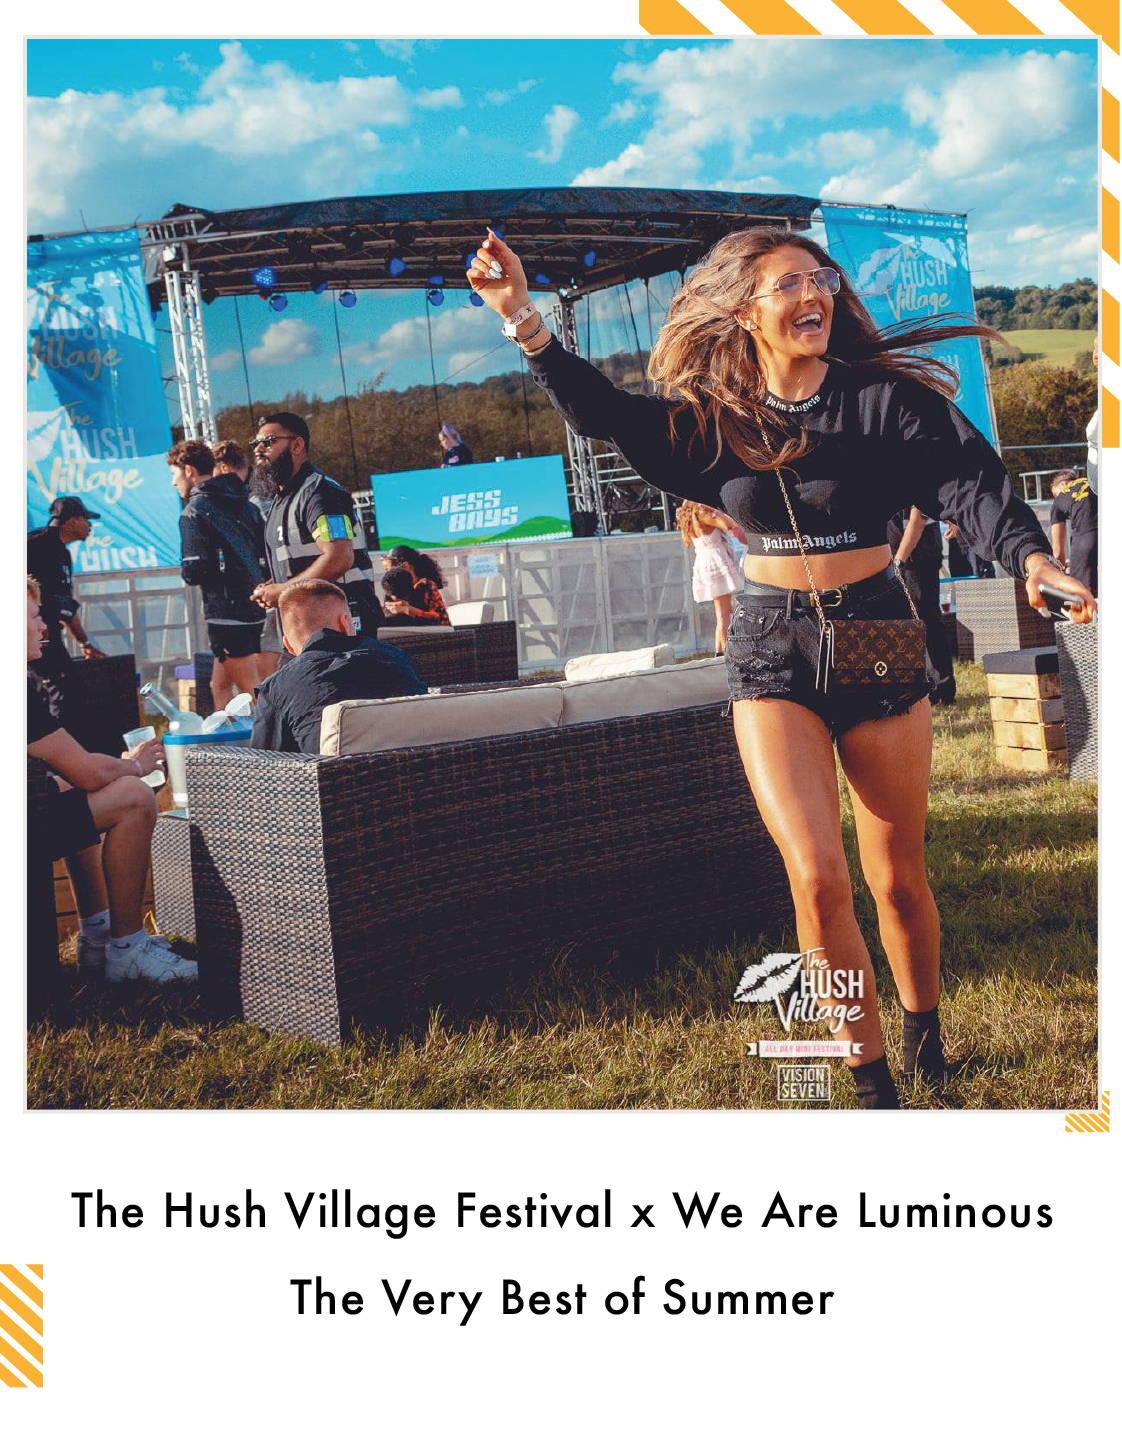 The Hush Village x We Are Luminous